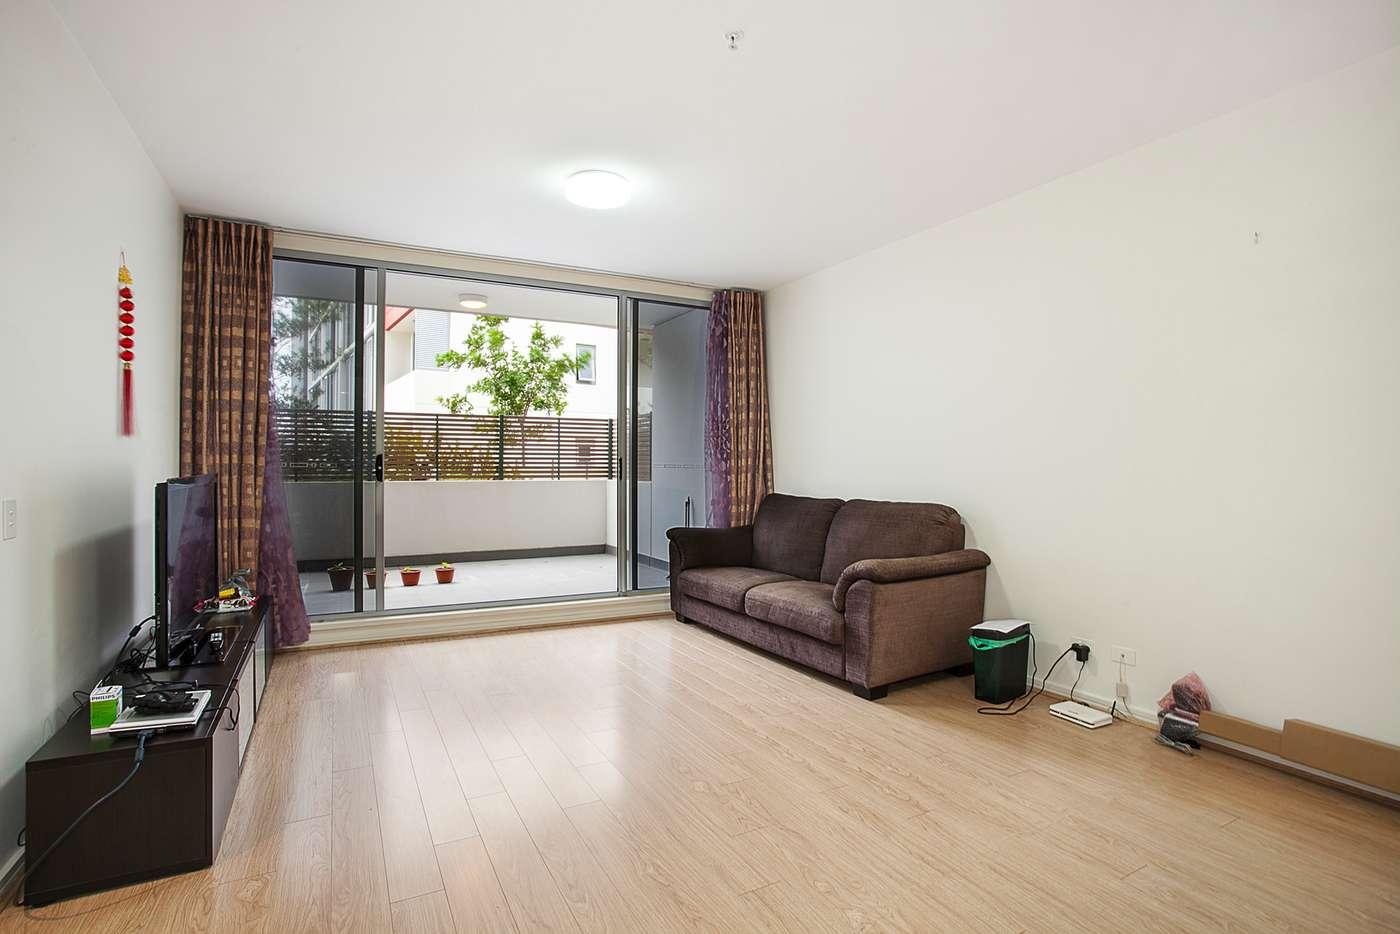 Main view of Homely apartment listing, 103B/1 Jack Brabham Drive, Hurstville NSW 2220